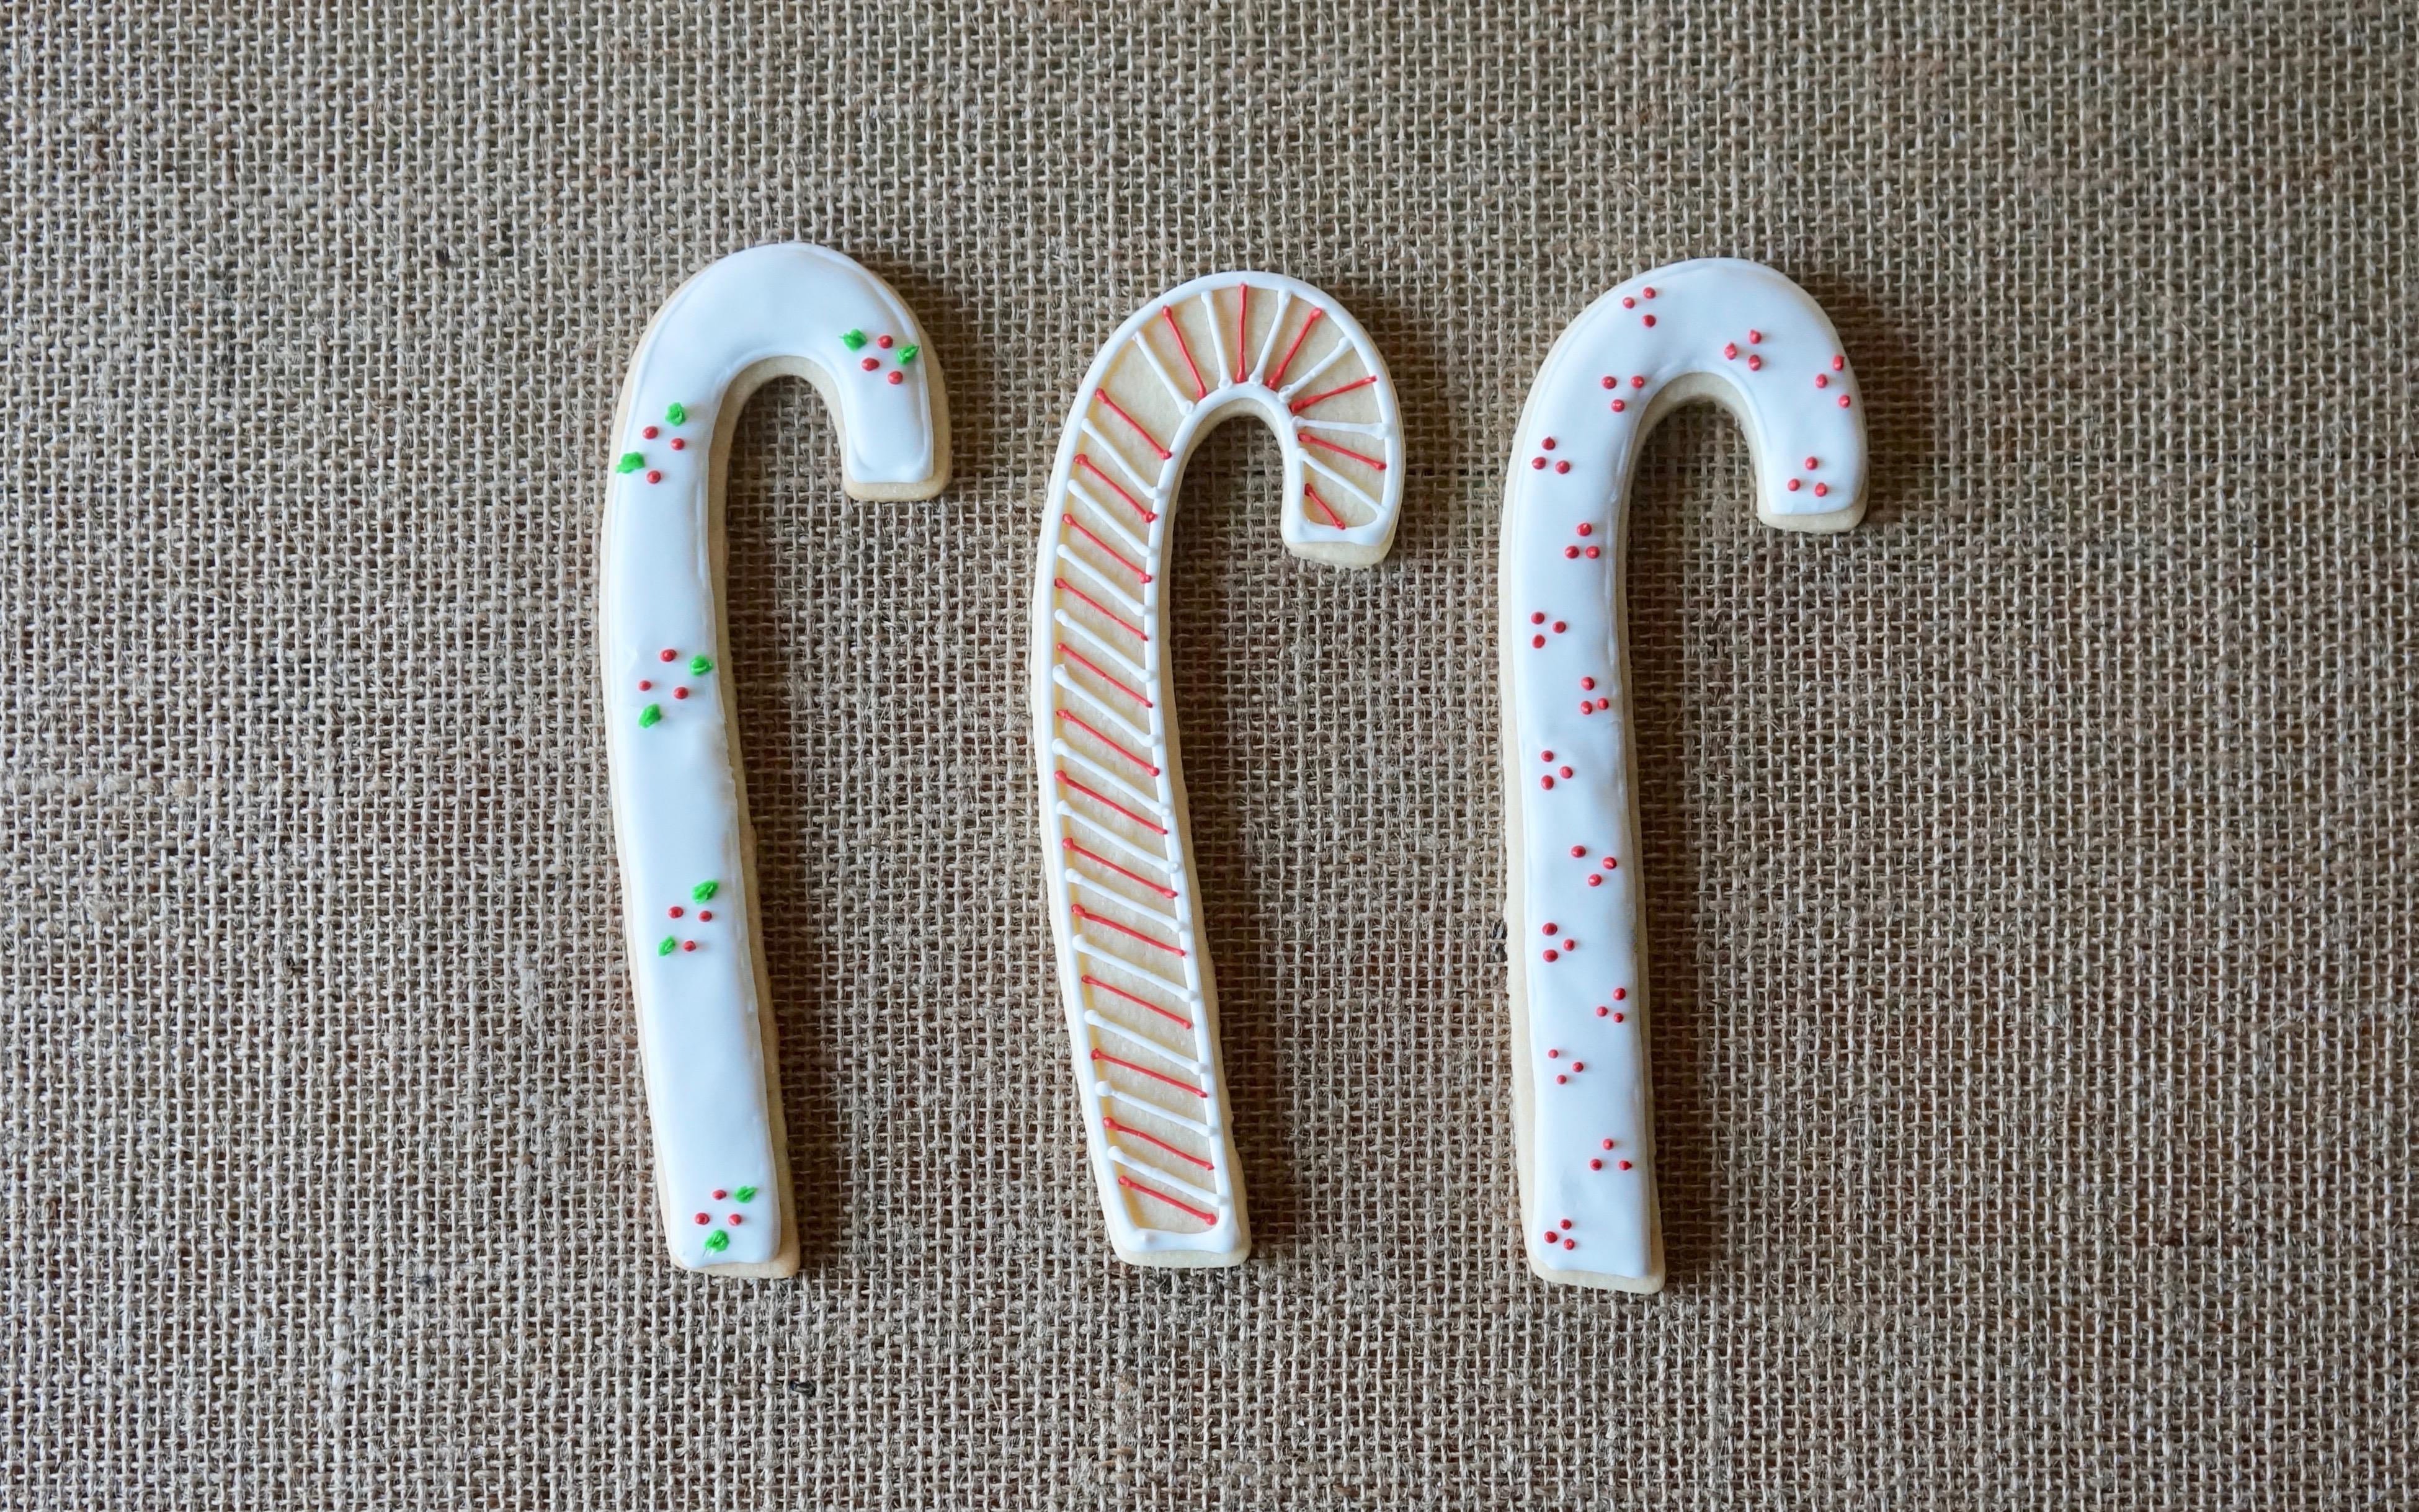 Candy-Stripe-Sugar-Cookies-Rebecca-Gordon-Publisher-Buttermilk-Lipstick-Culinary-Entertaining-Techniques-RebeccaGordon-Pastry-Chef-Birmingham-Alabama